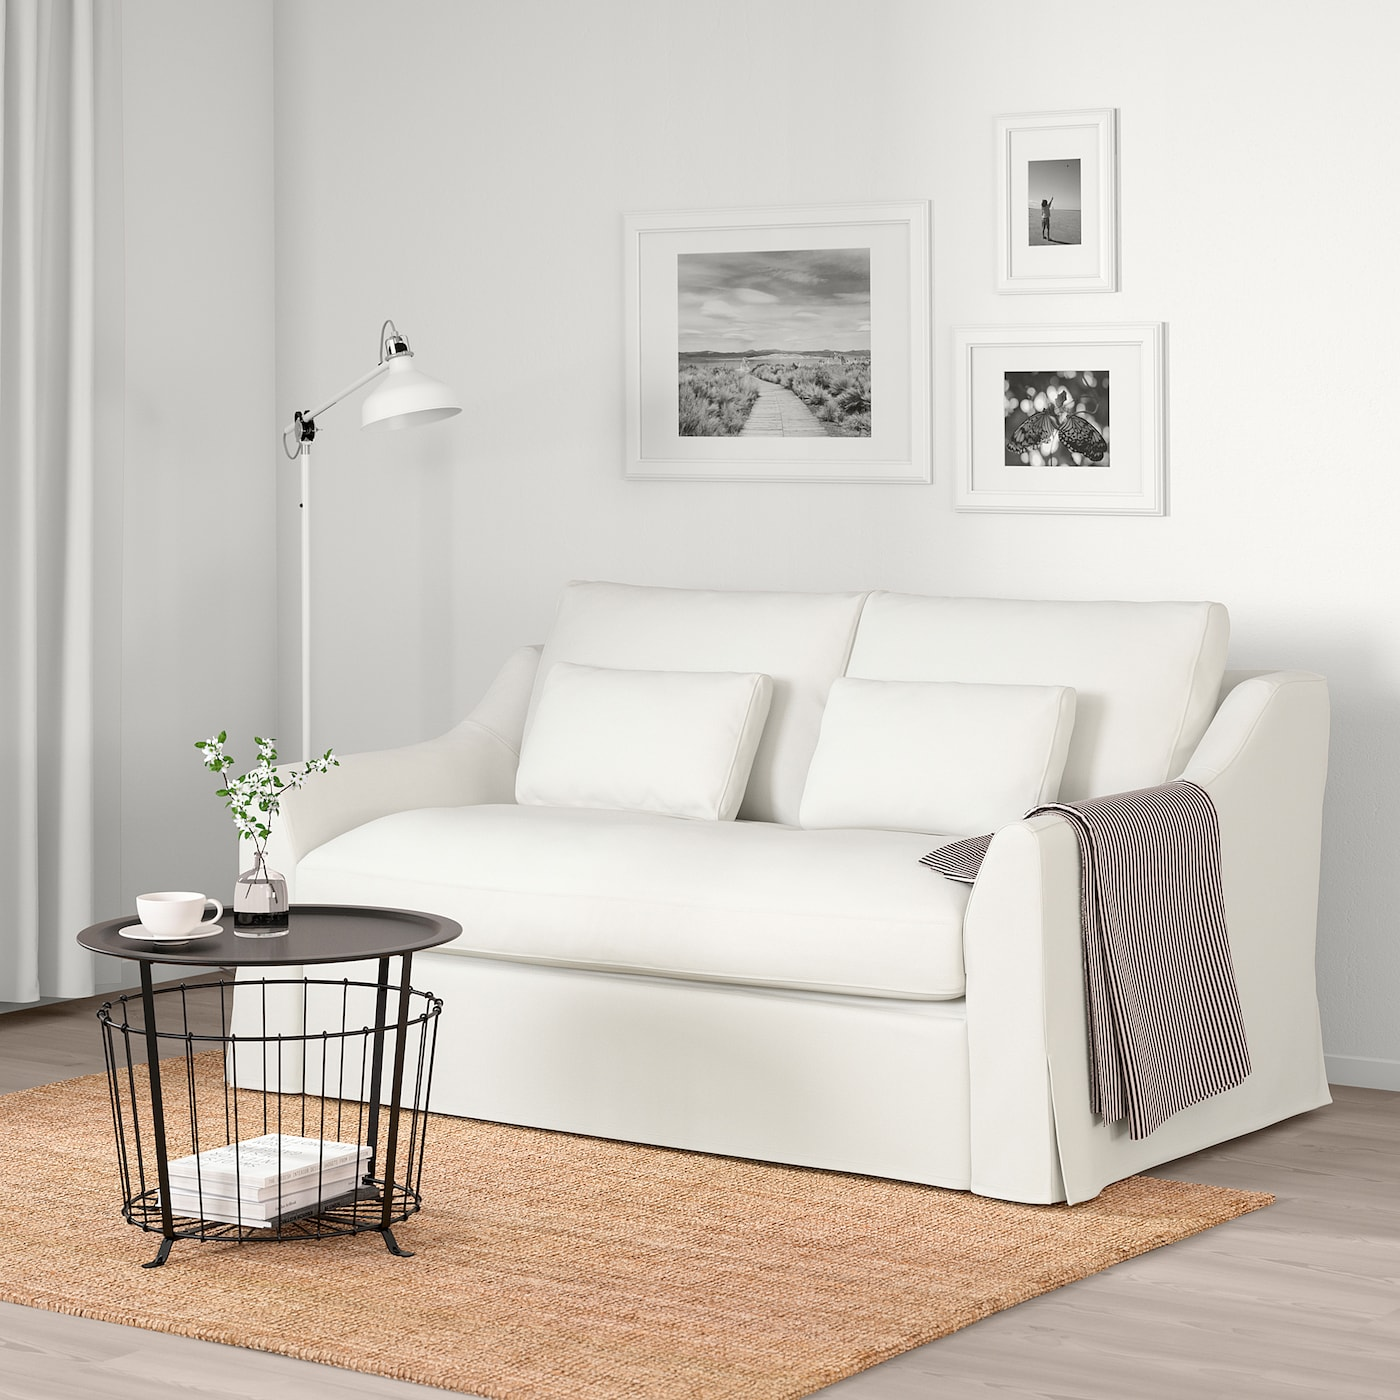 FÄRLÖV Sleeper Sofa, Flodafors White - IKEA